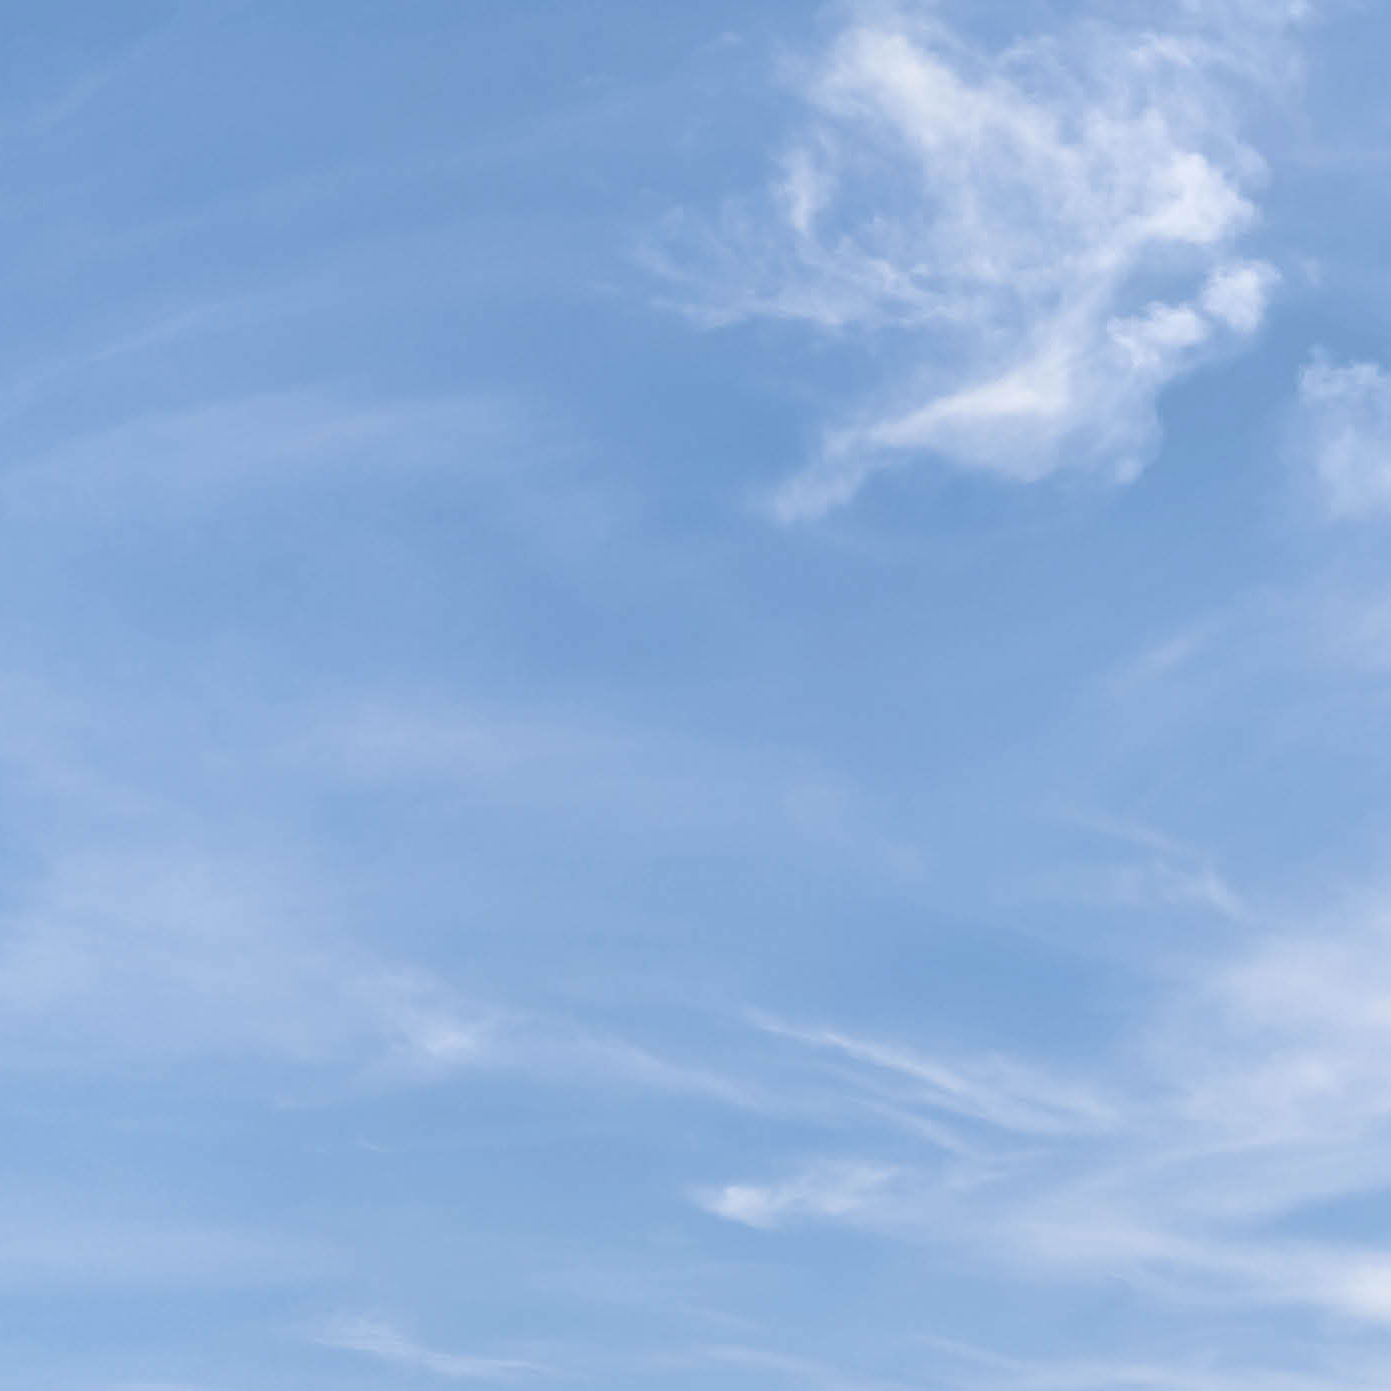 Endloser Himmel Teil 2 – Modellbahn Hintergrund 300cm x 50 cm 2